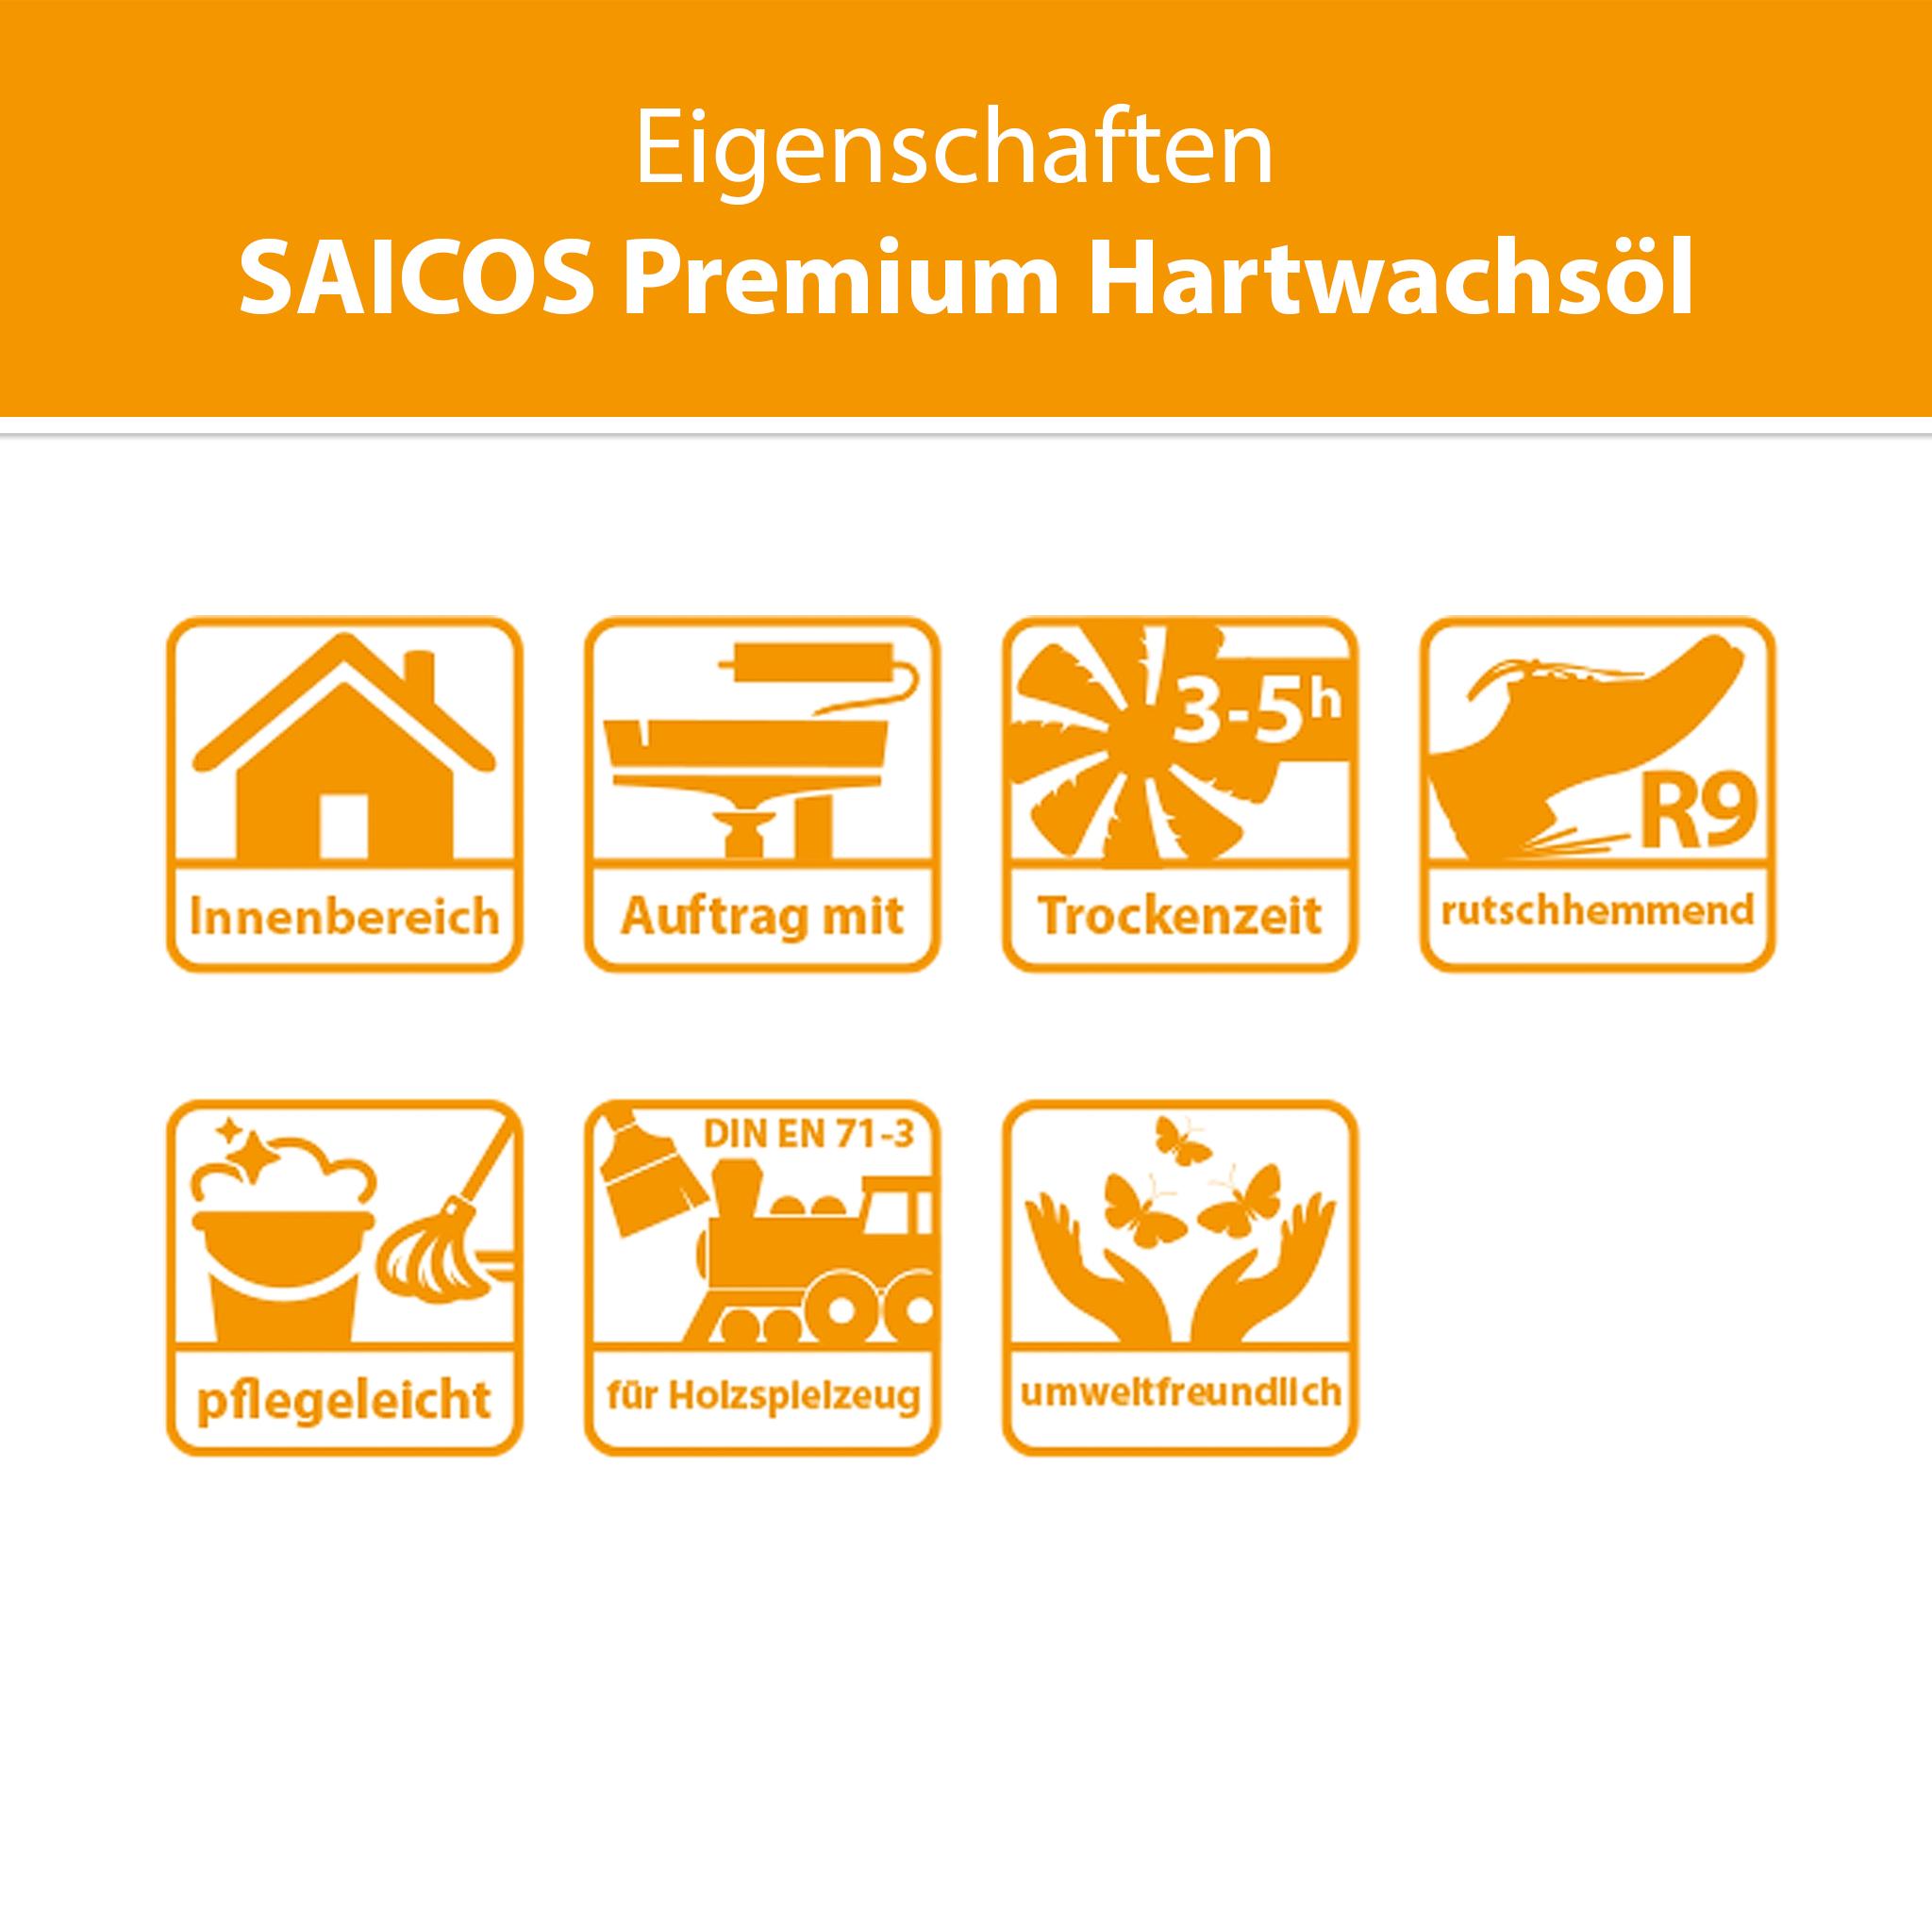 SAICOS Premium Hartwachsöl Matt